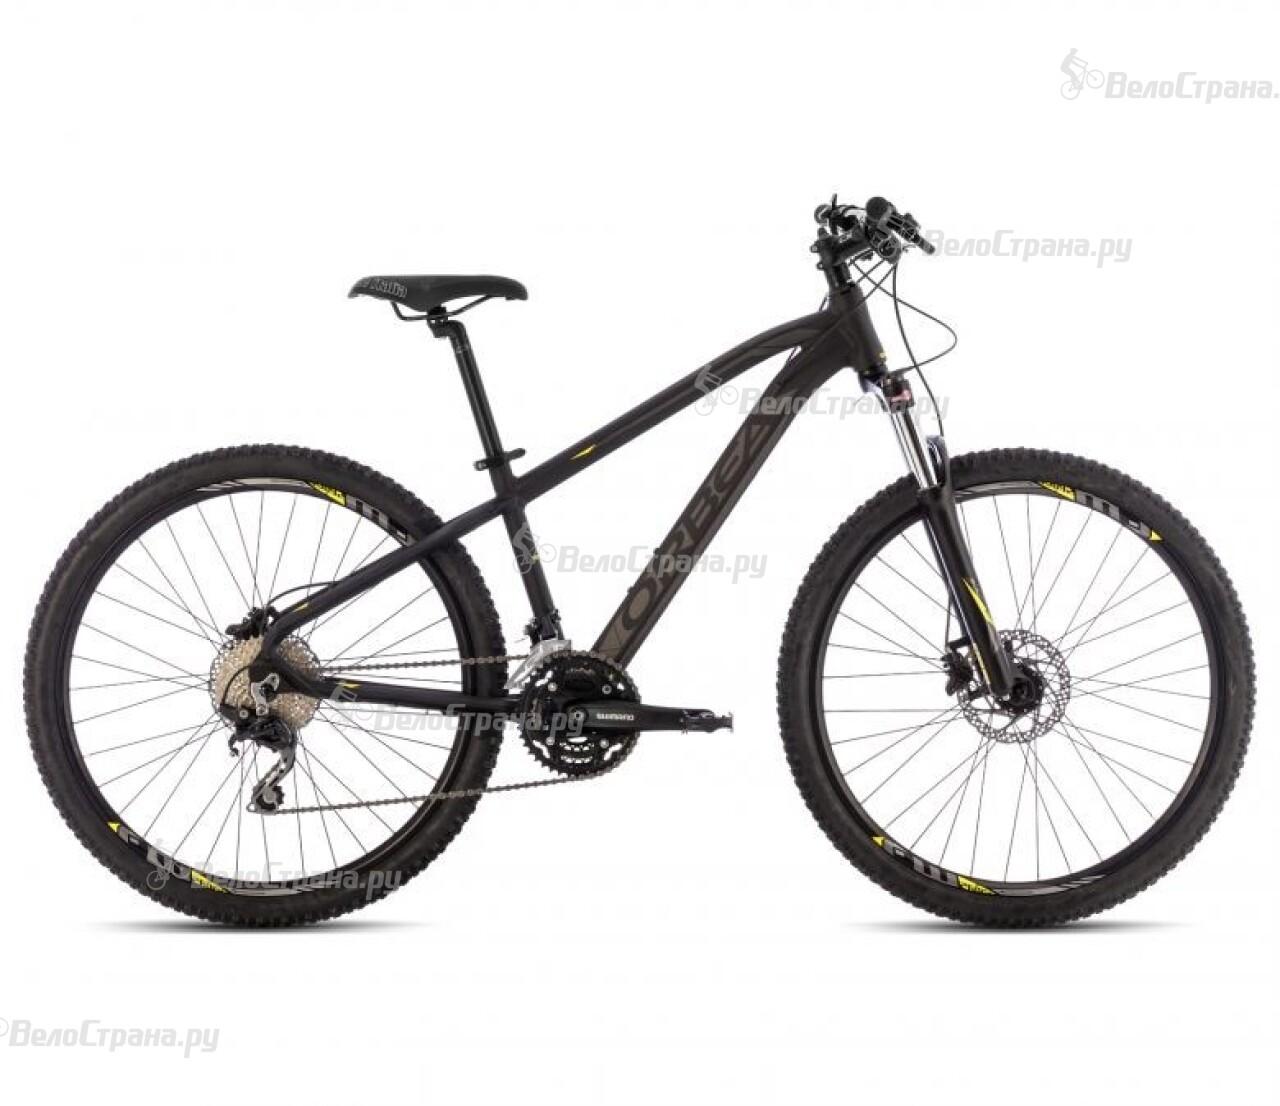 Велосипед Orbea Mx 26 10 Dama (2014) велосипед orbea mx 24 xc 2014